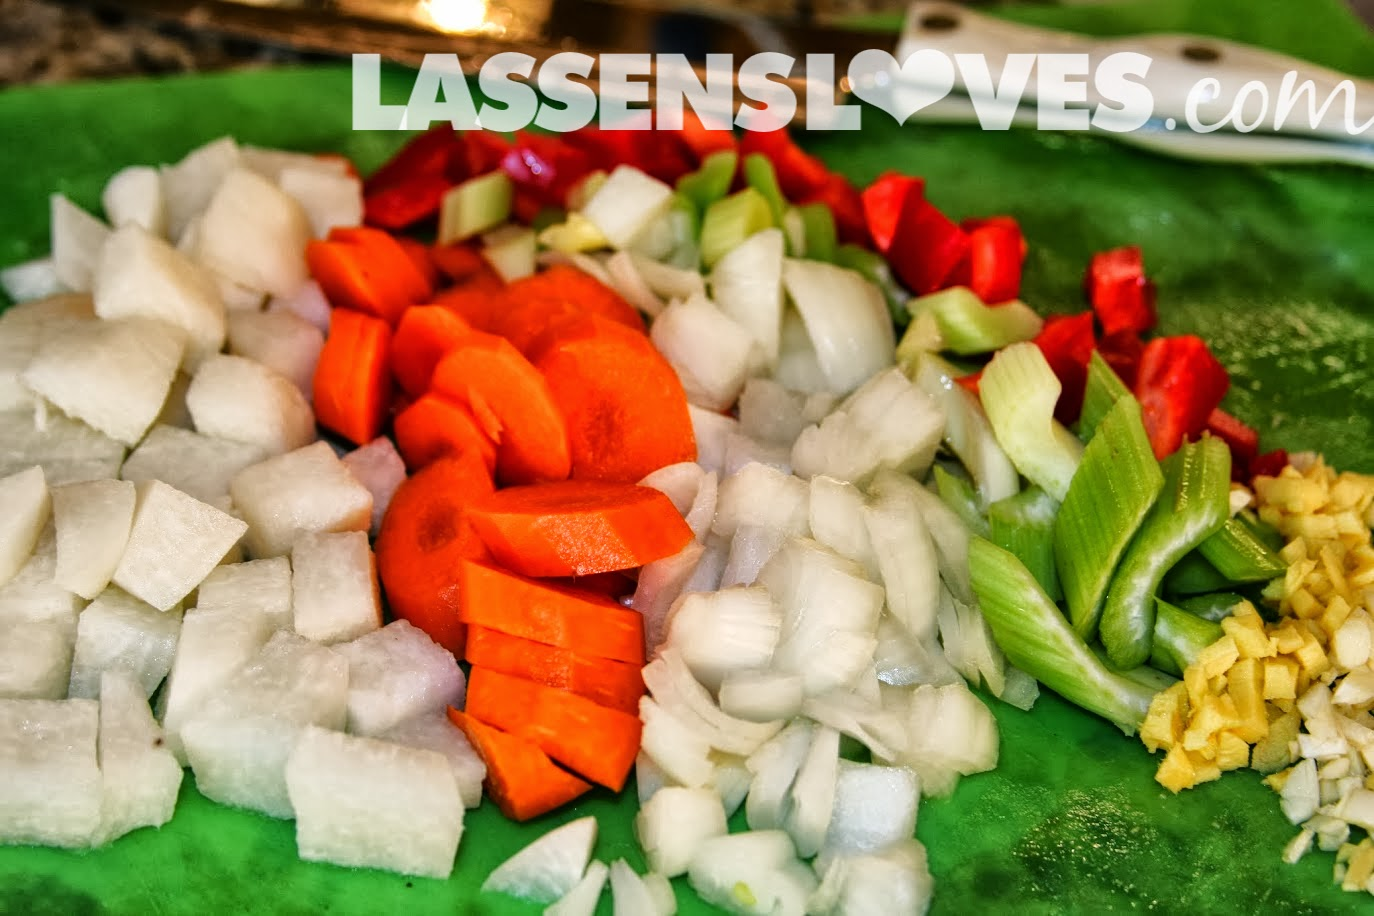 organic+jicama, Lassen's, lassensloves.com, jicama+recipe, jicama+stir+fry